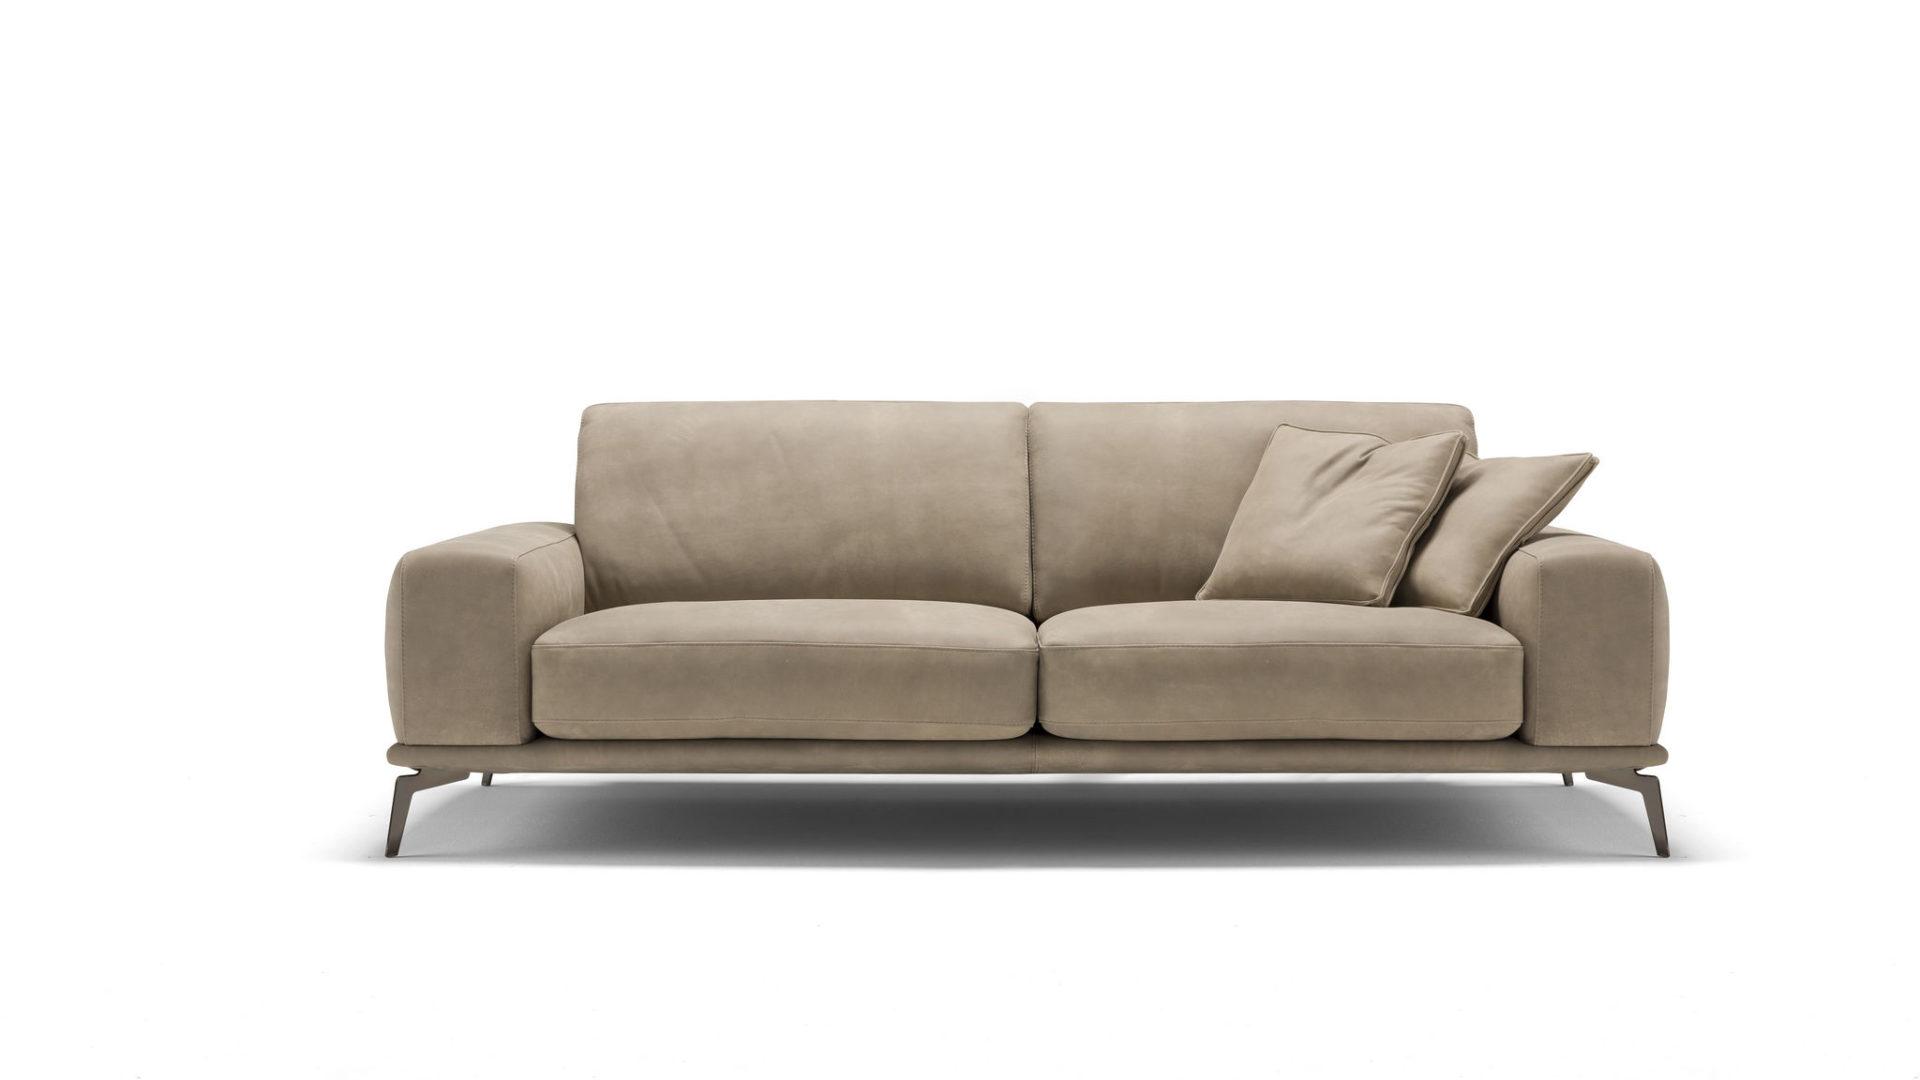 Tivoli sofa